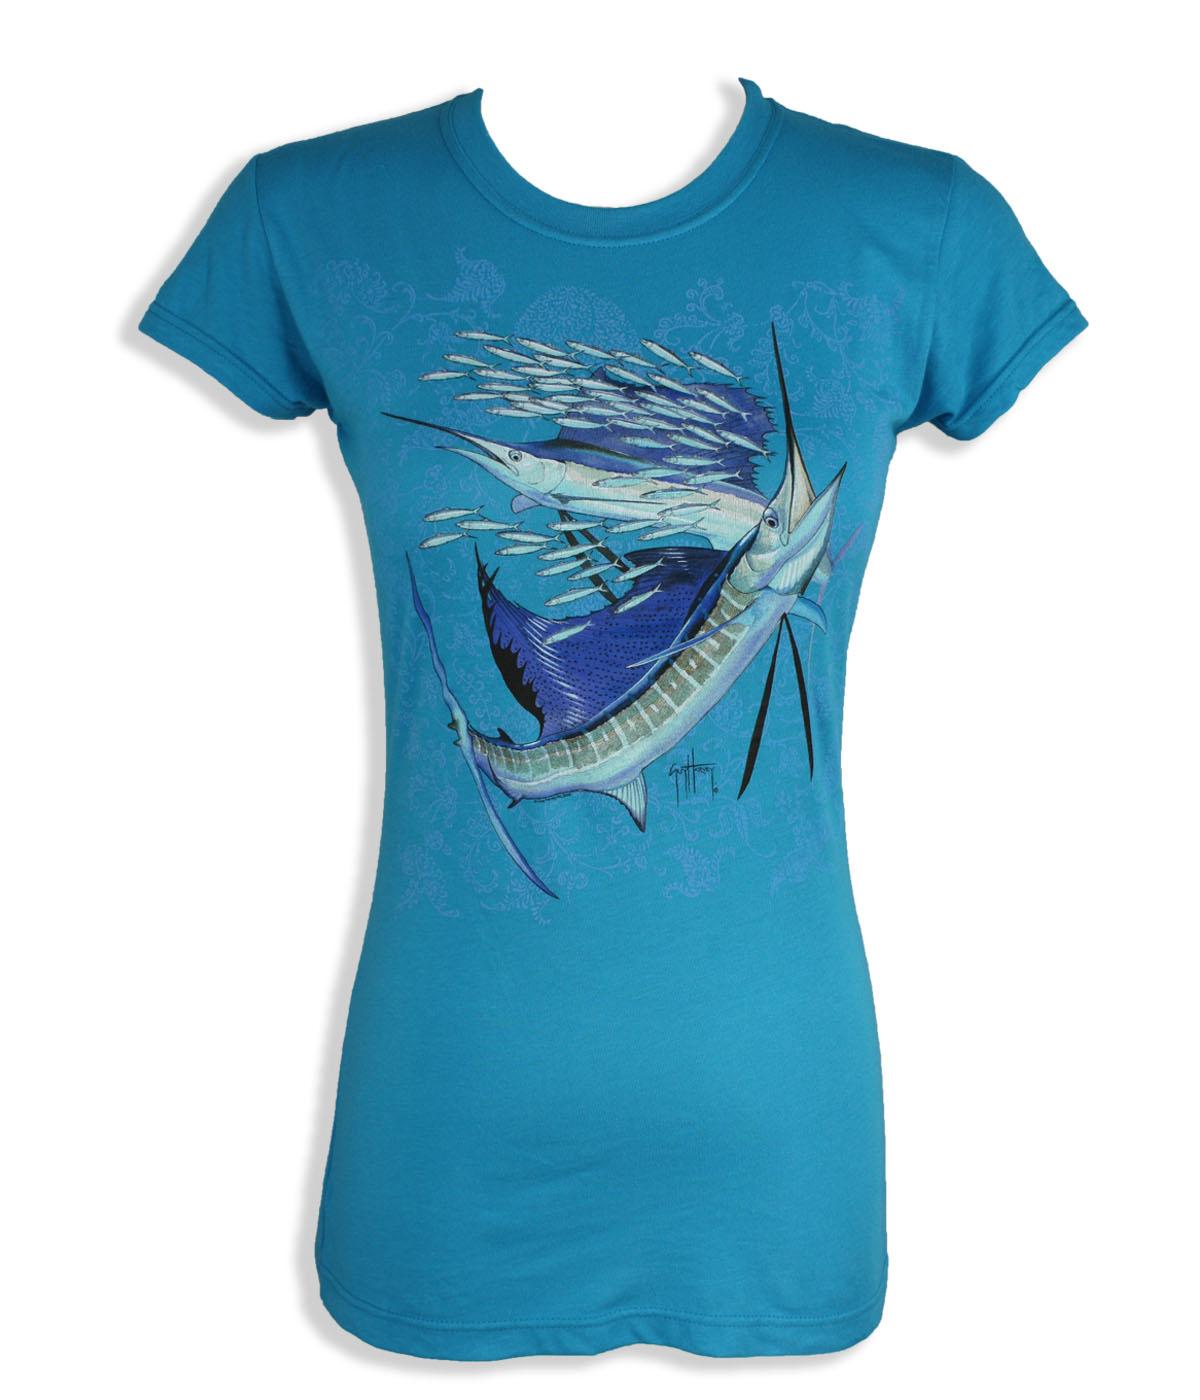 Guy Harvey Womens T-Shirt – Paisley Sails – Turquoise